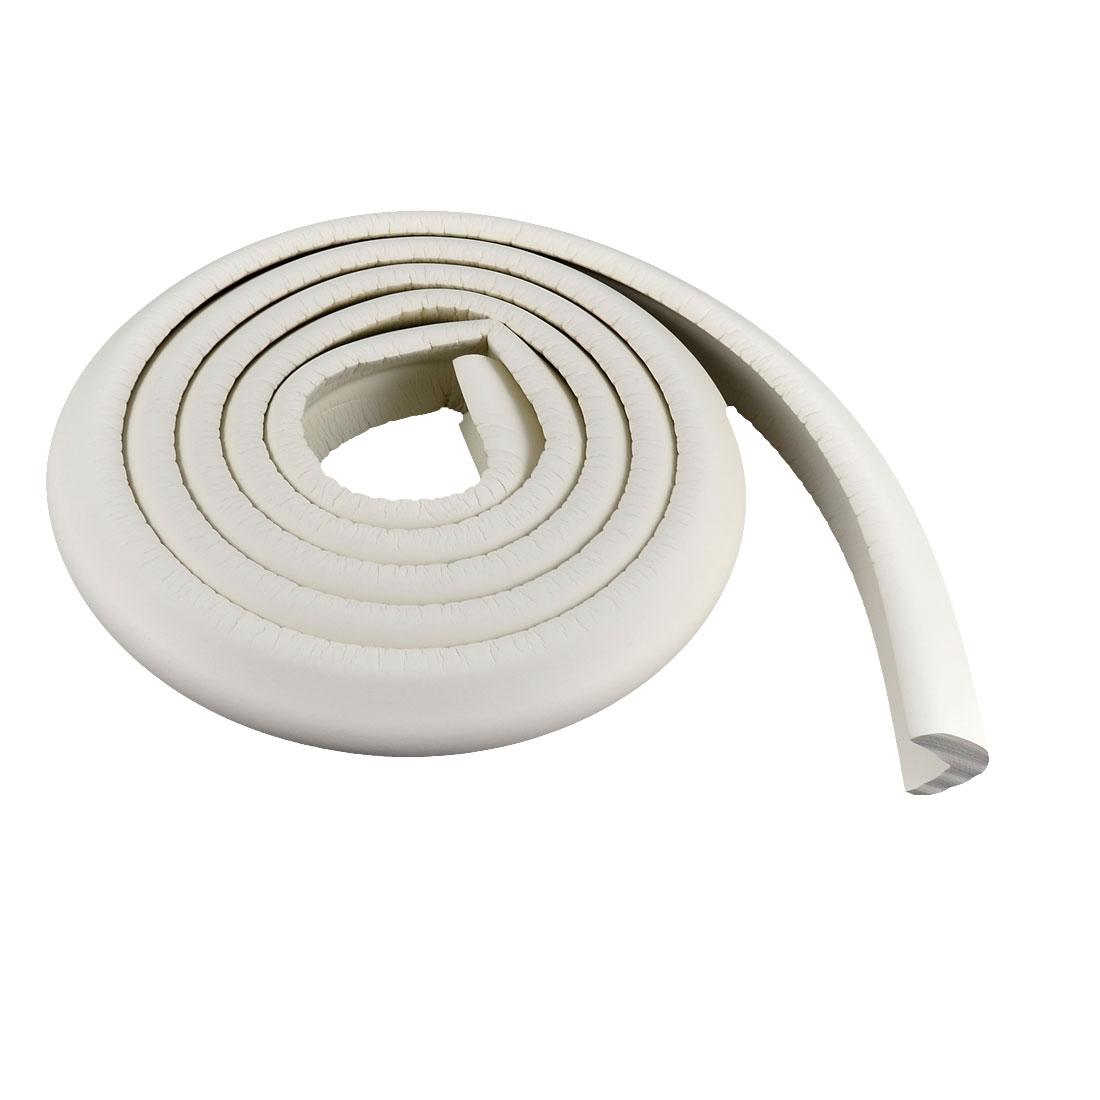 Furniture Table Proofing Corner Edge Guard Protector Cushion White